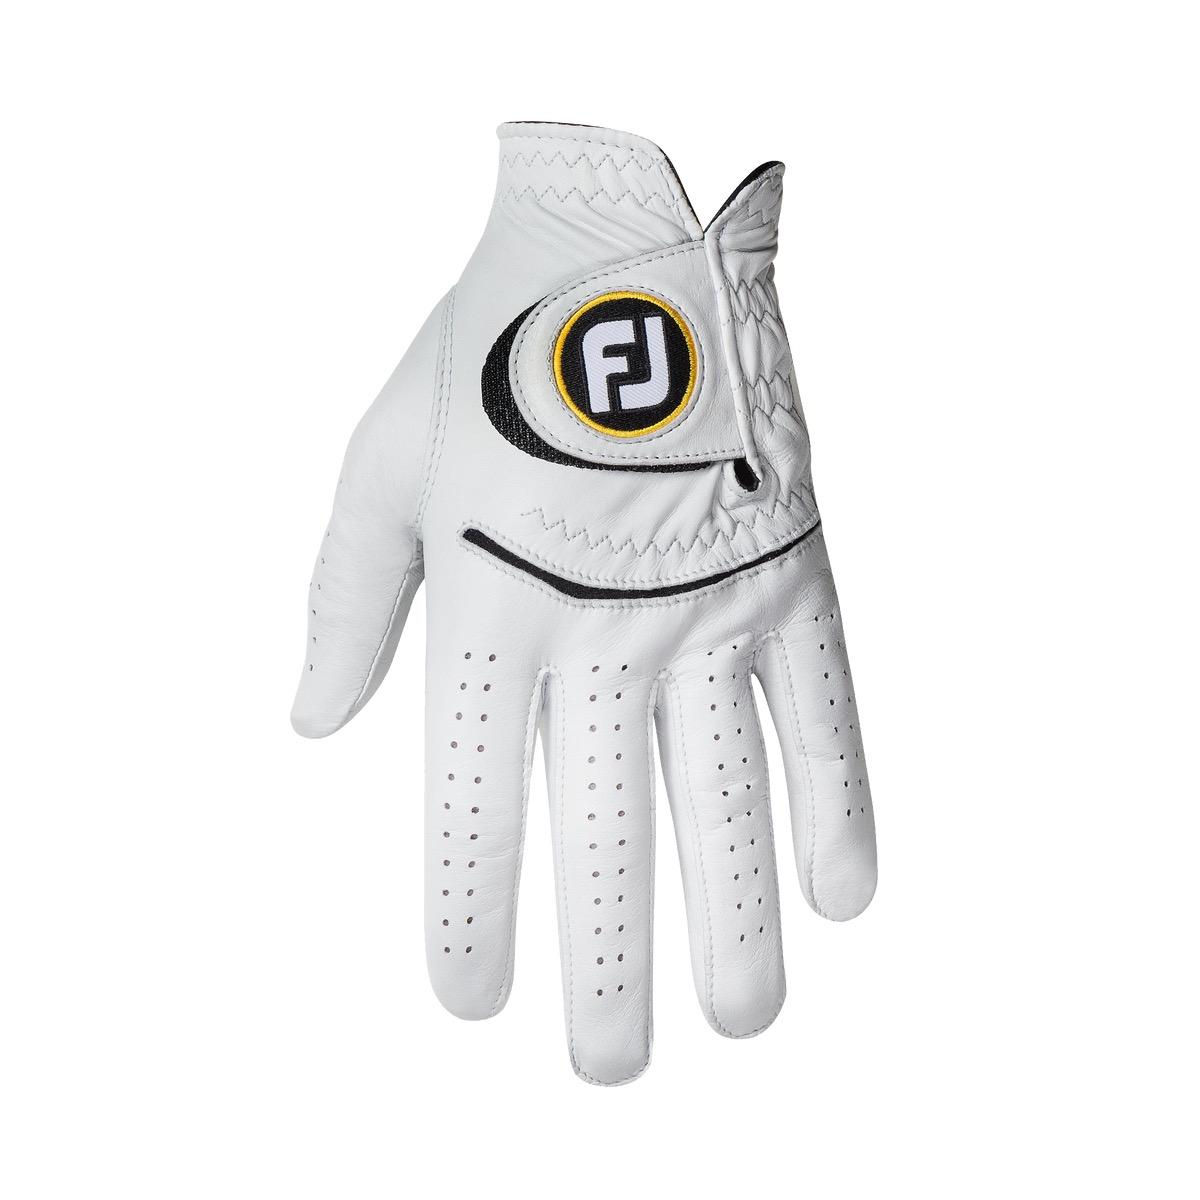 StaSof Handschuh, weiß